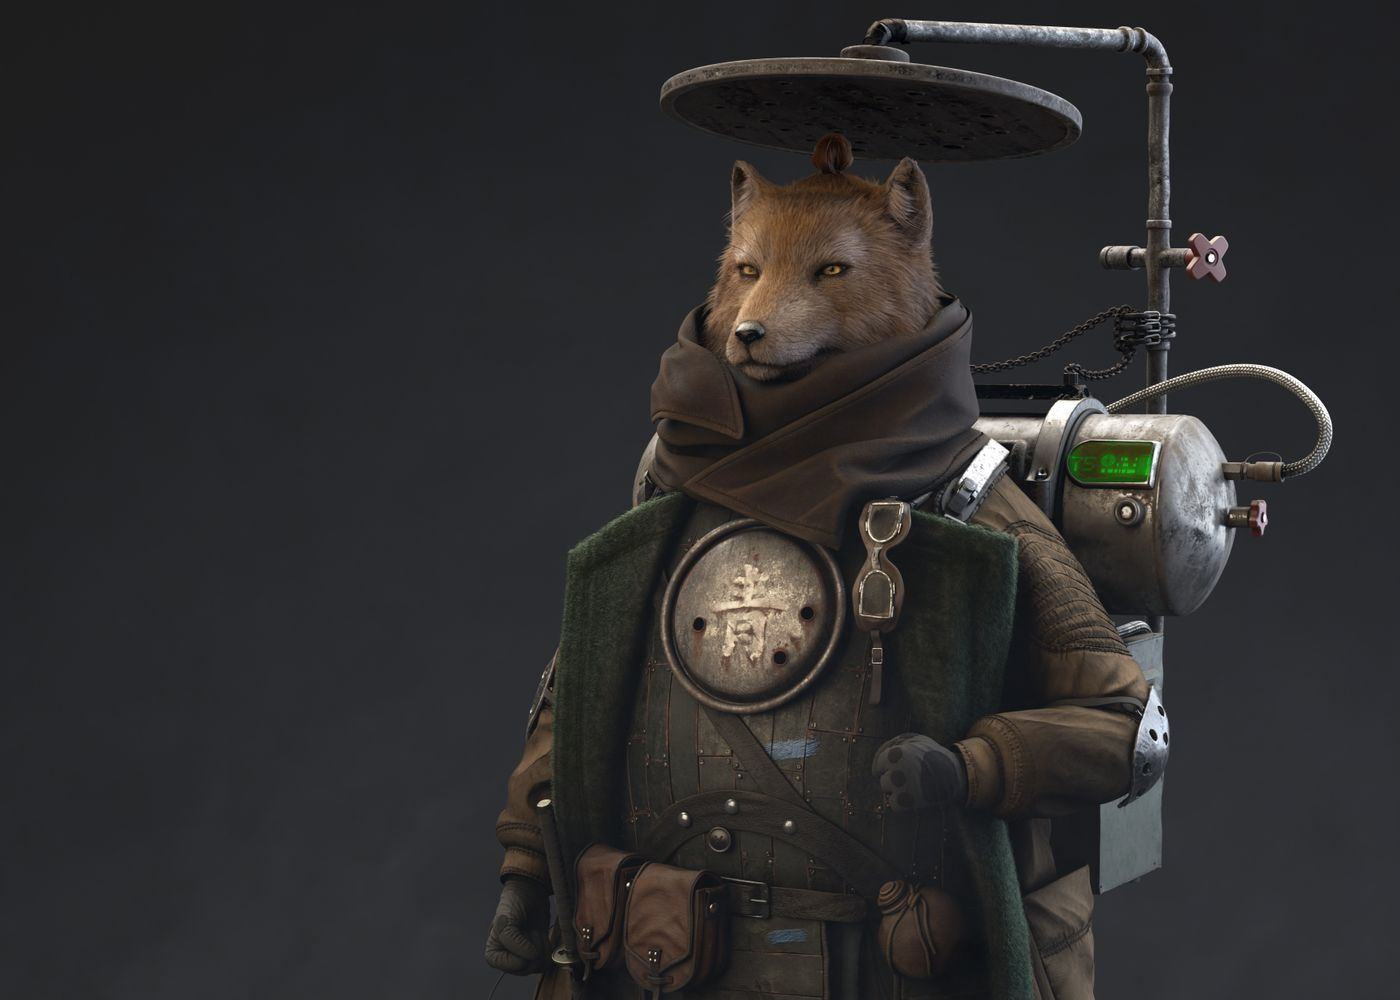 Foxy Warrior: The Life Supplier